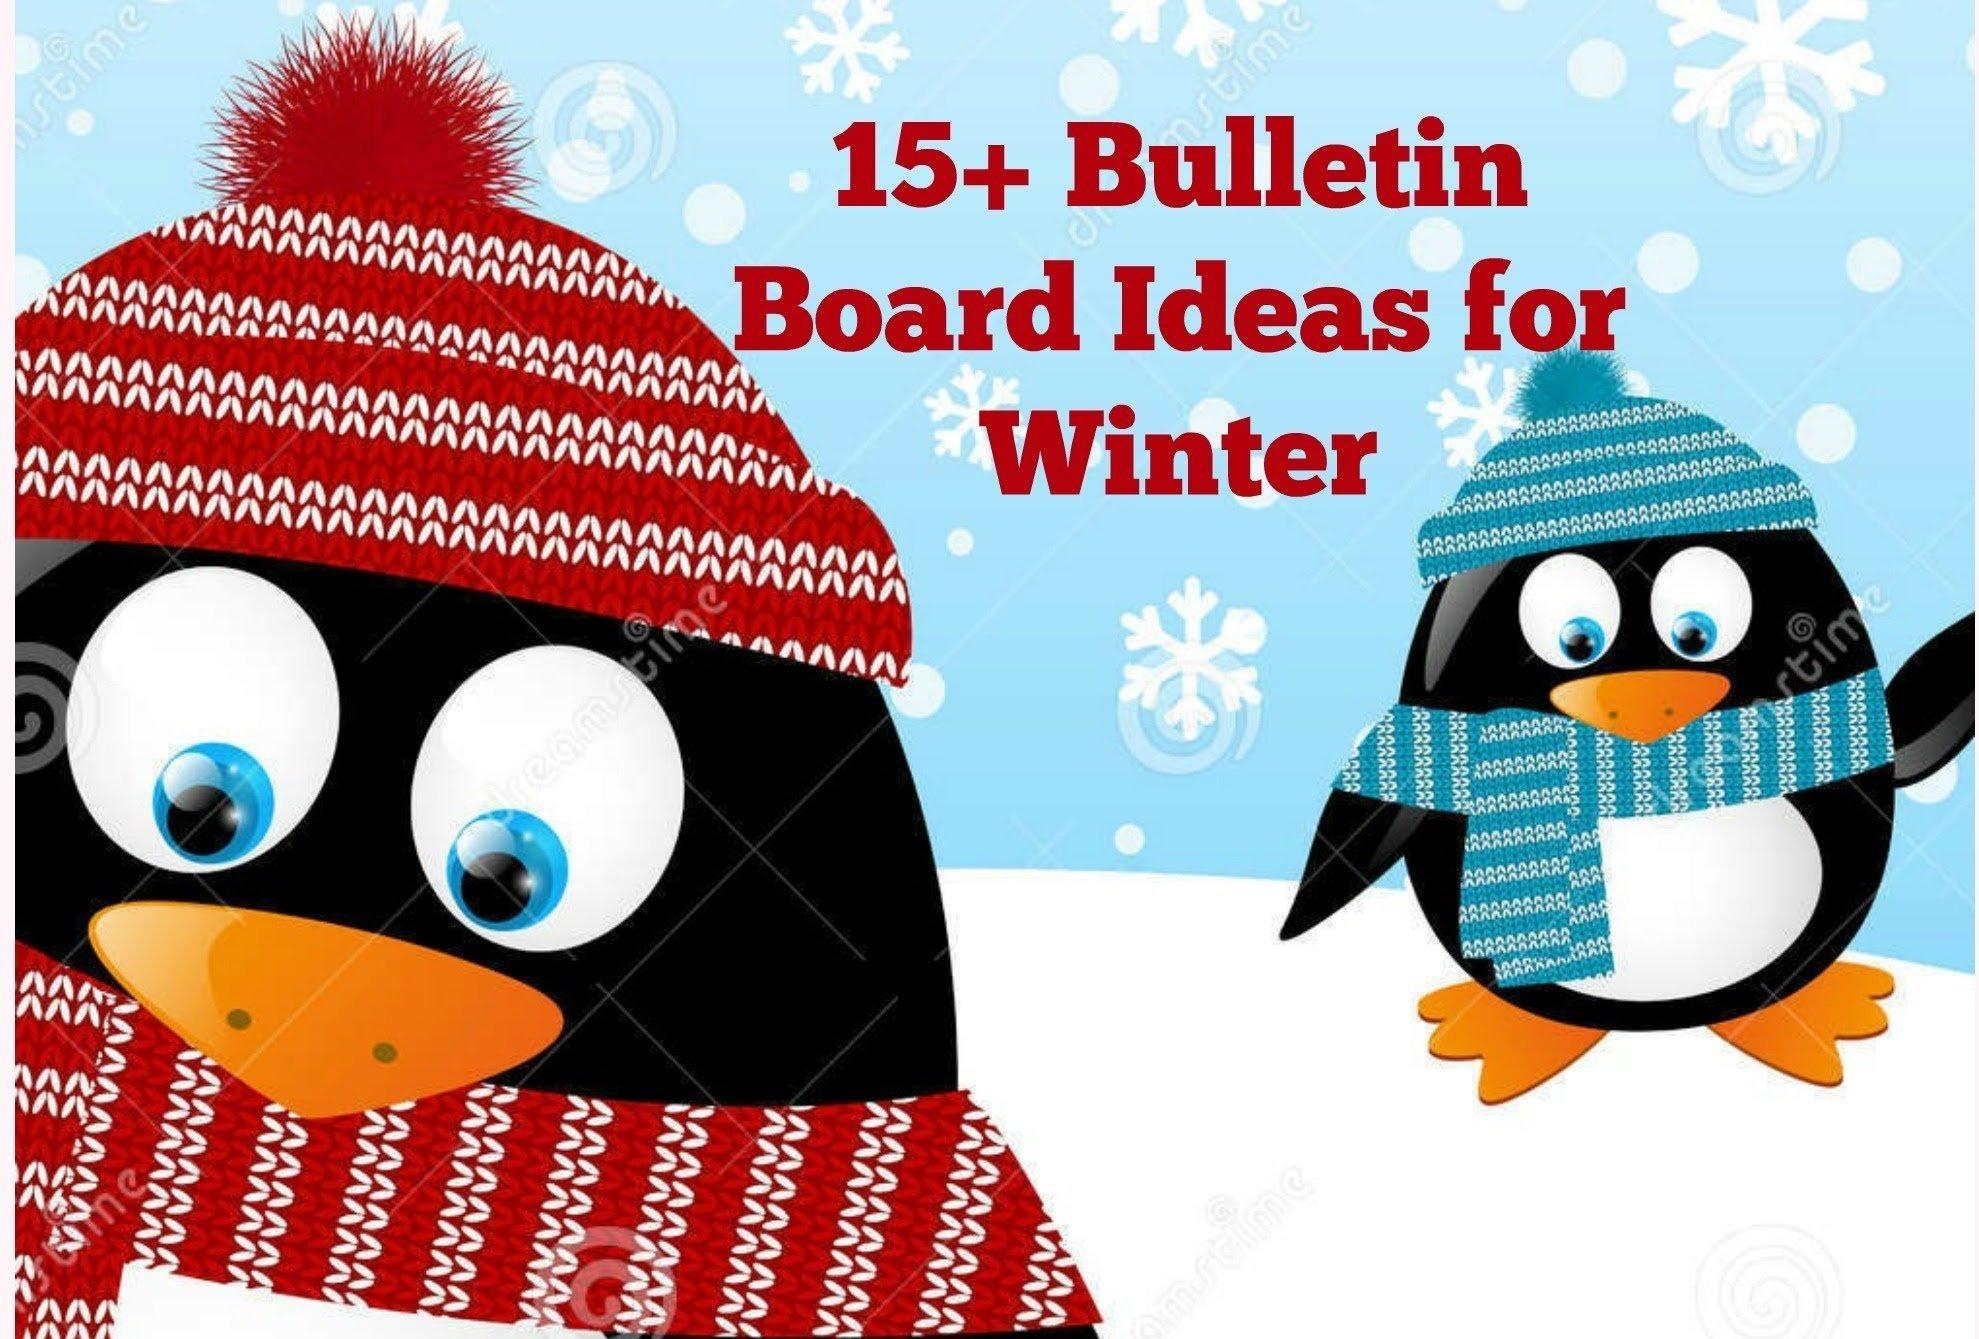 10 Ideal Bulletin Board Ideas For January bulletin board ideas for winter youtube 3